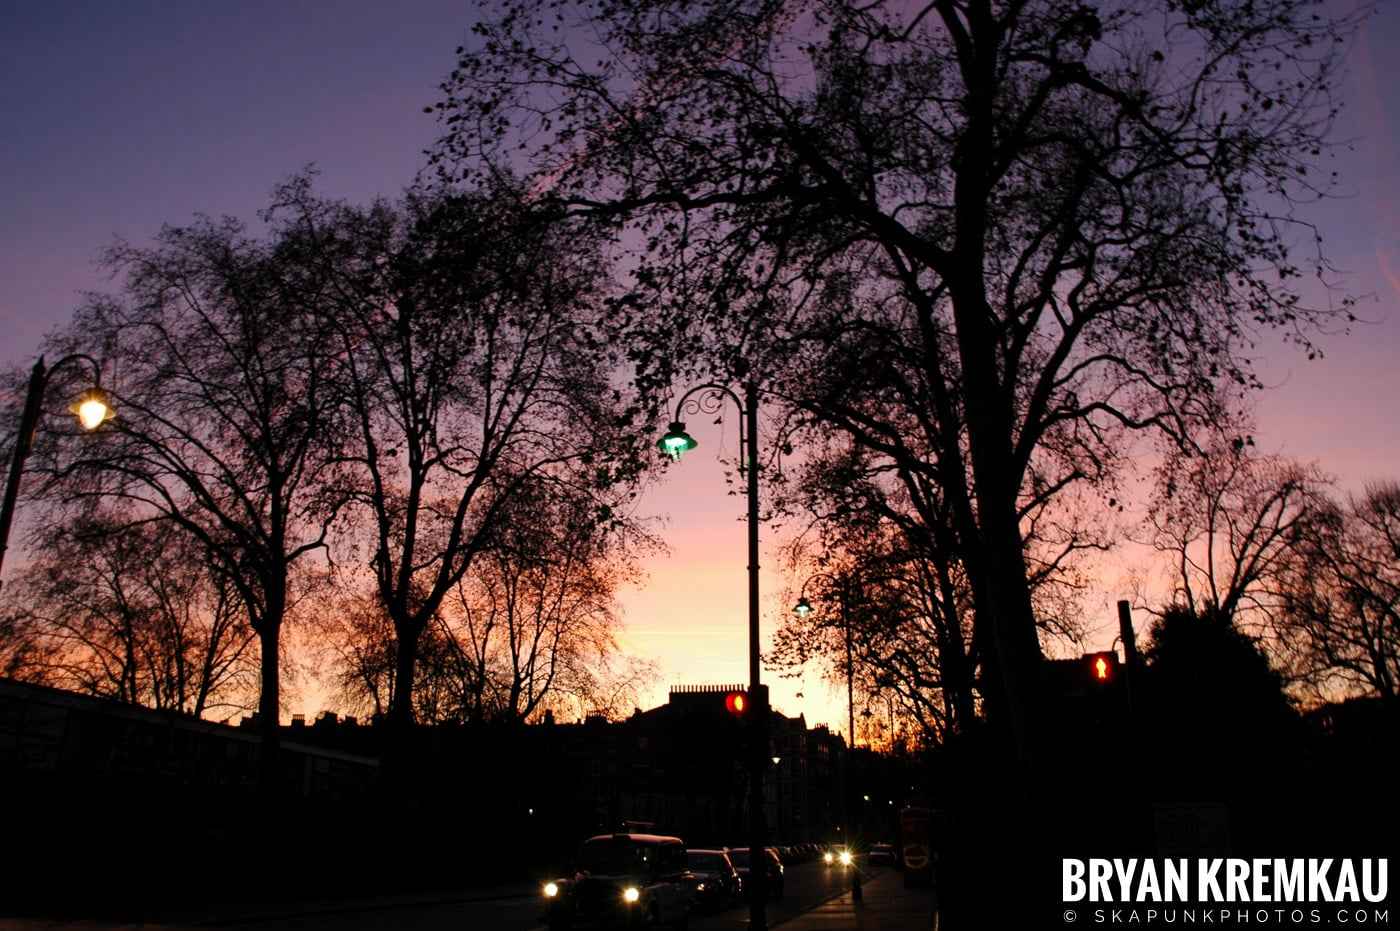 London, England - Day 2 - 12.17.05 (2)